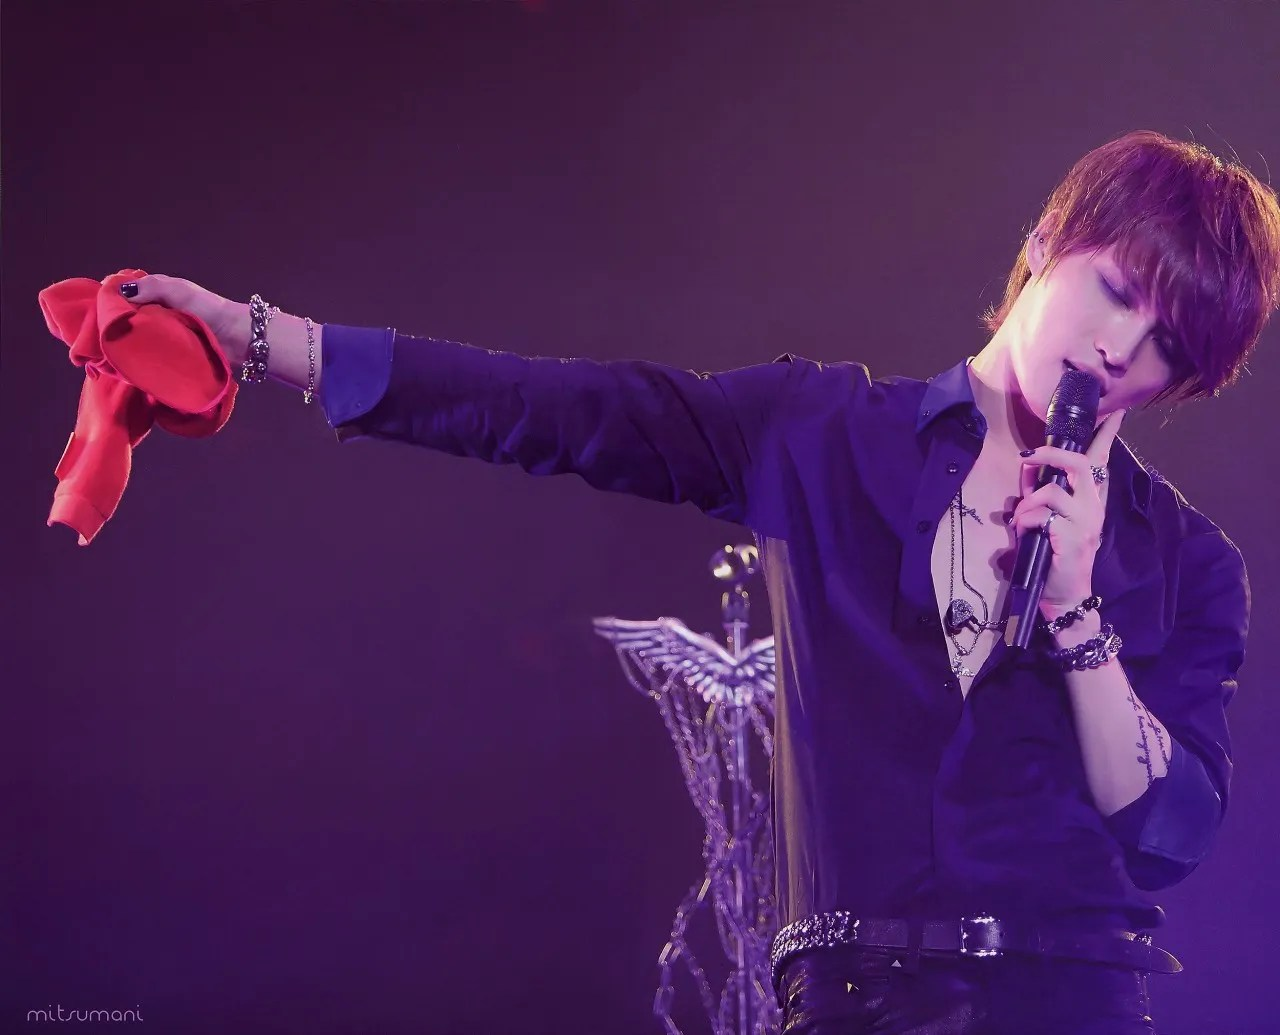 photo Mitsumani_11.jpg